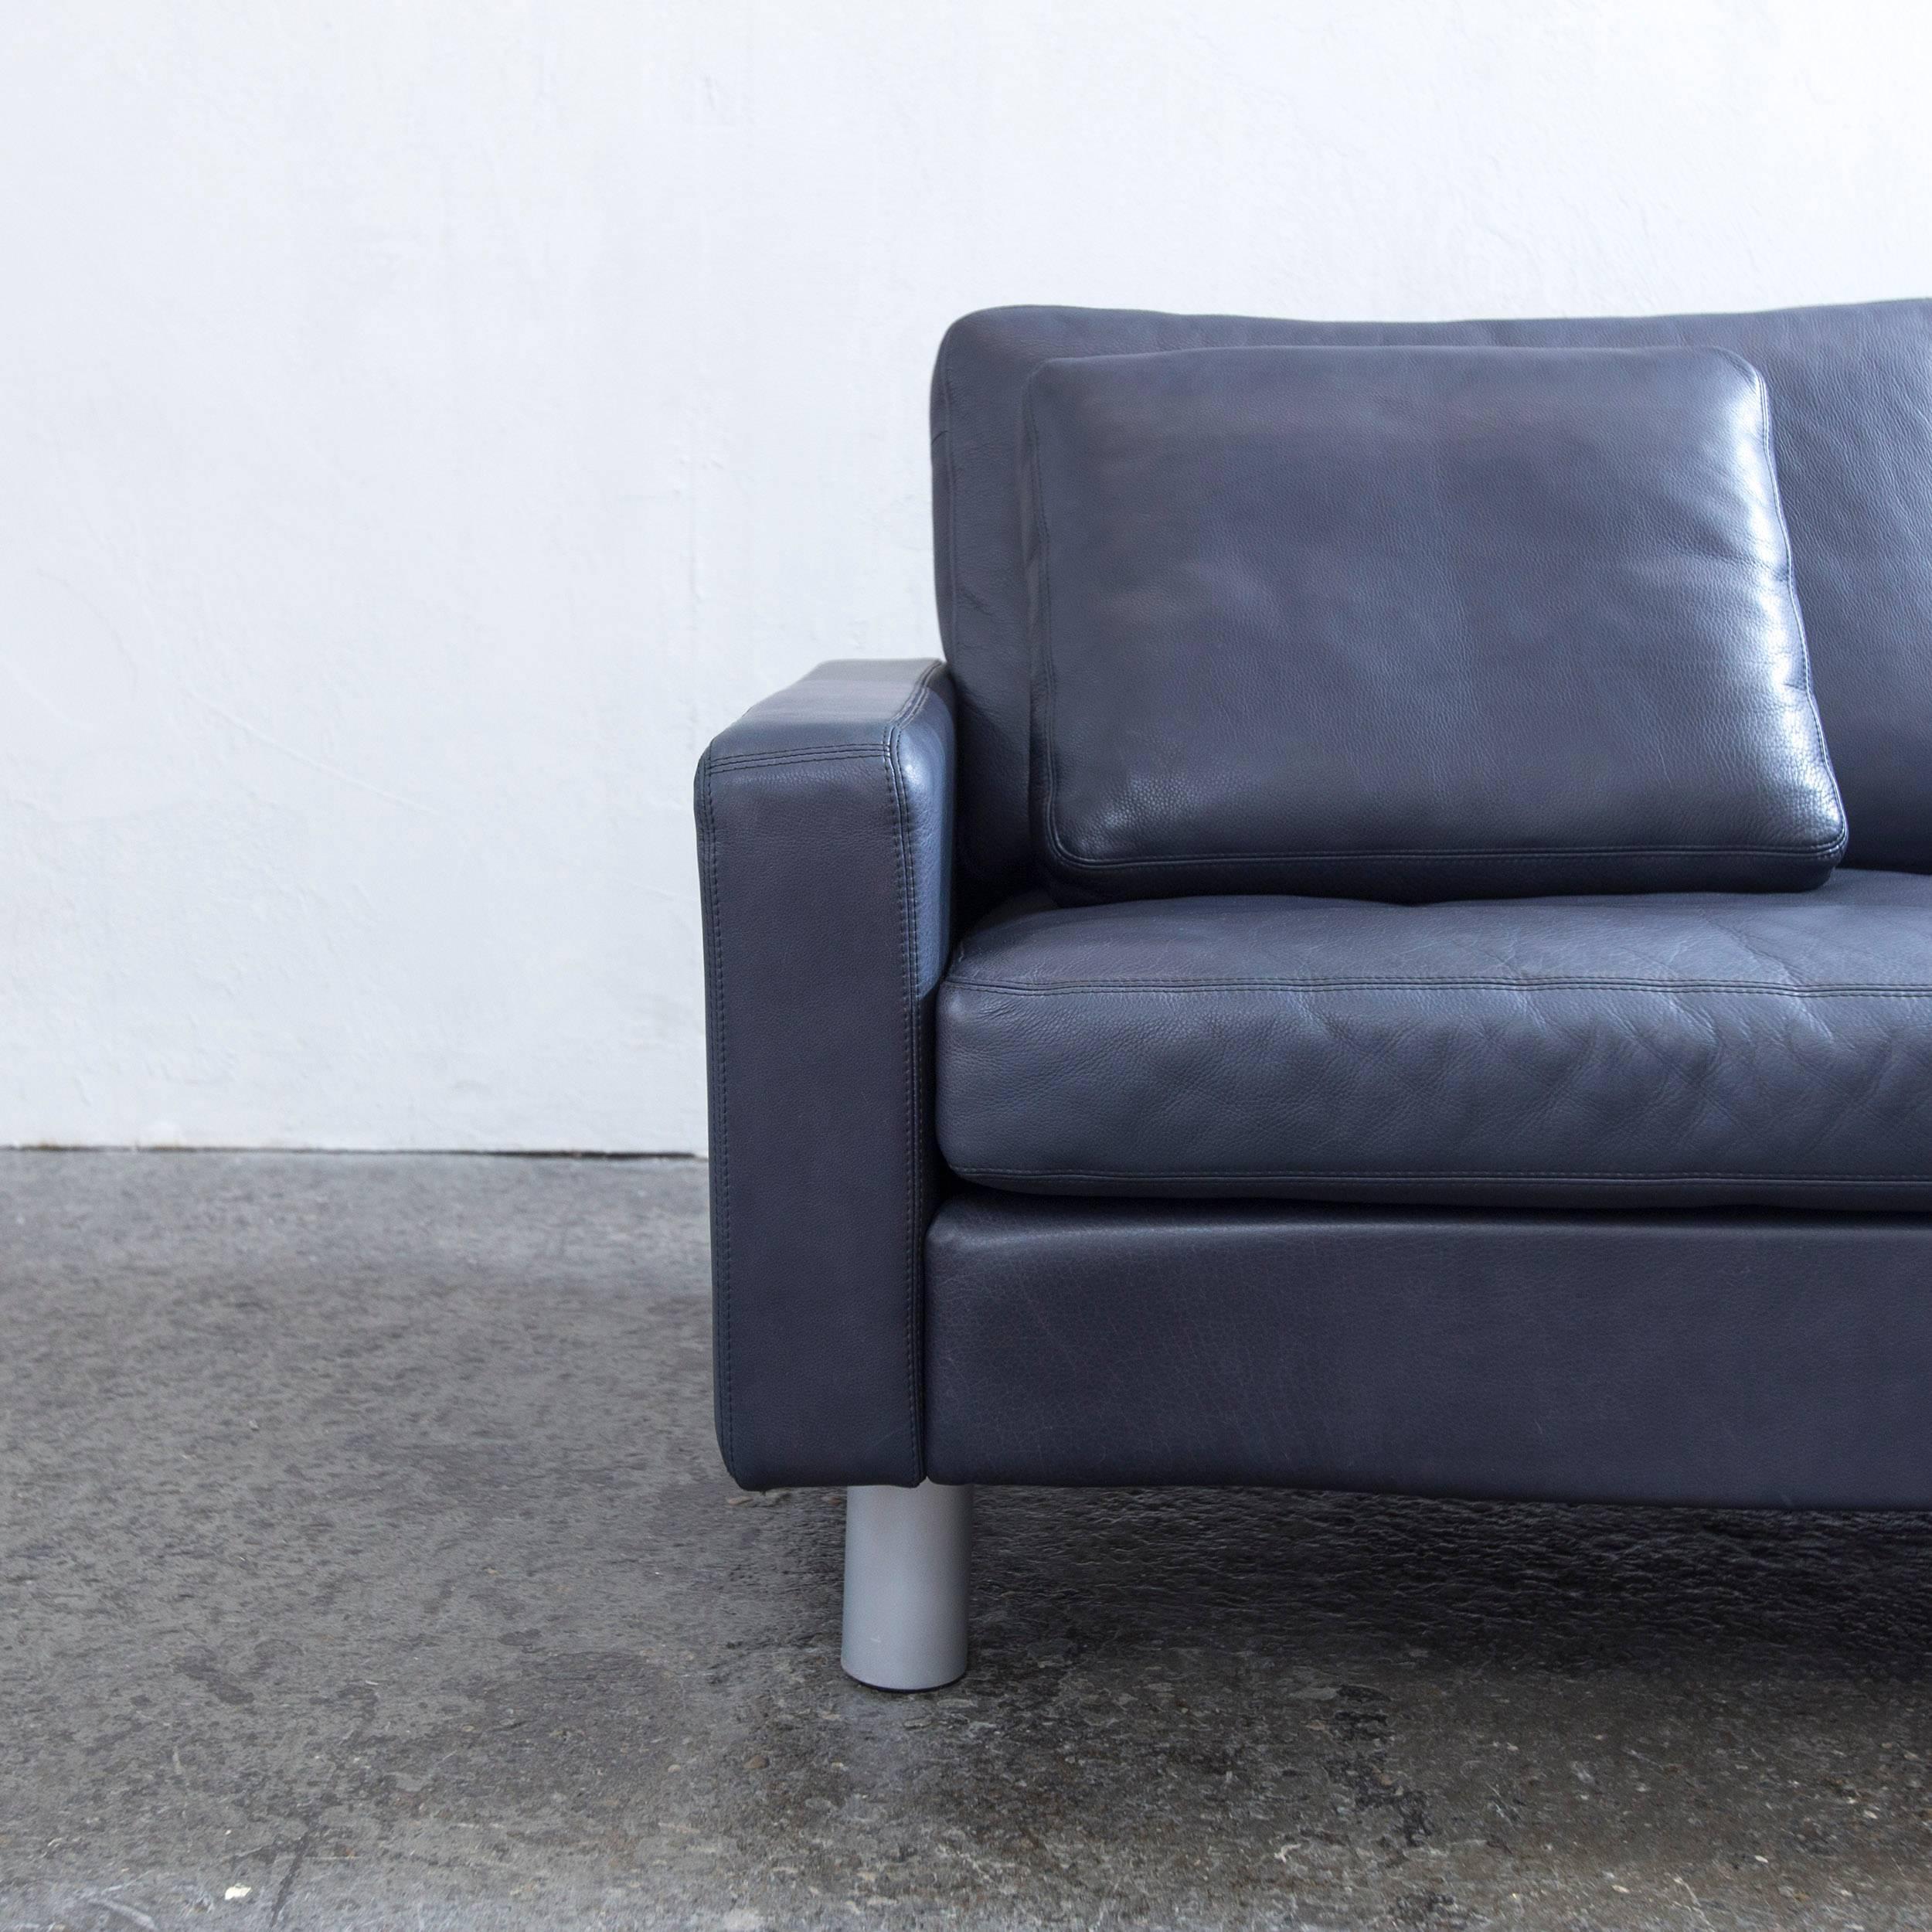 Emejing Designer Couch Modelle Komfort Ideas - Interior Design Ideas ...